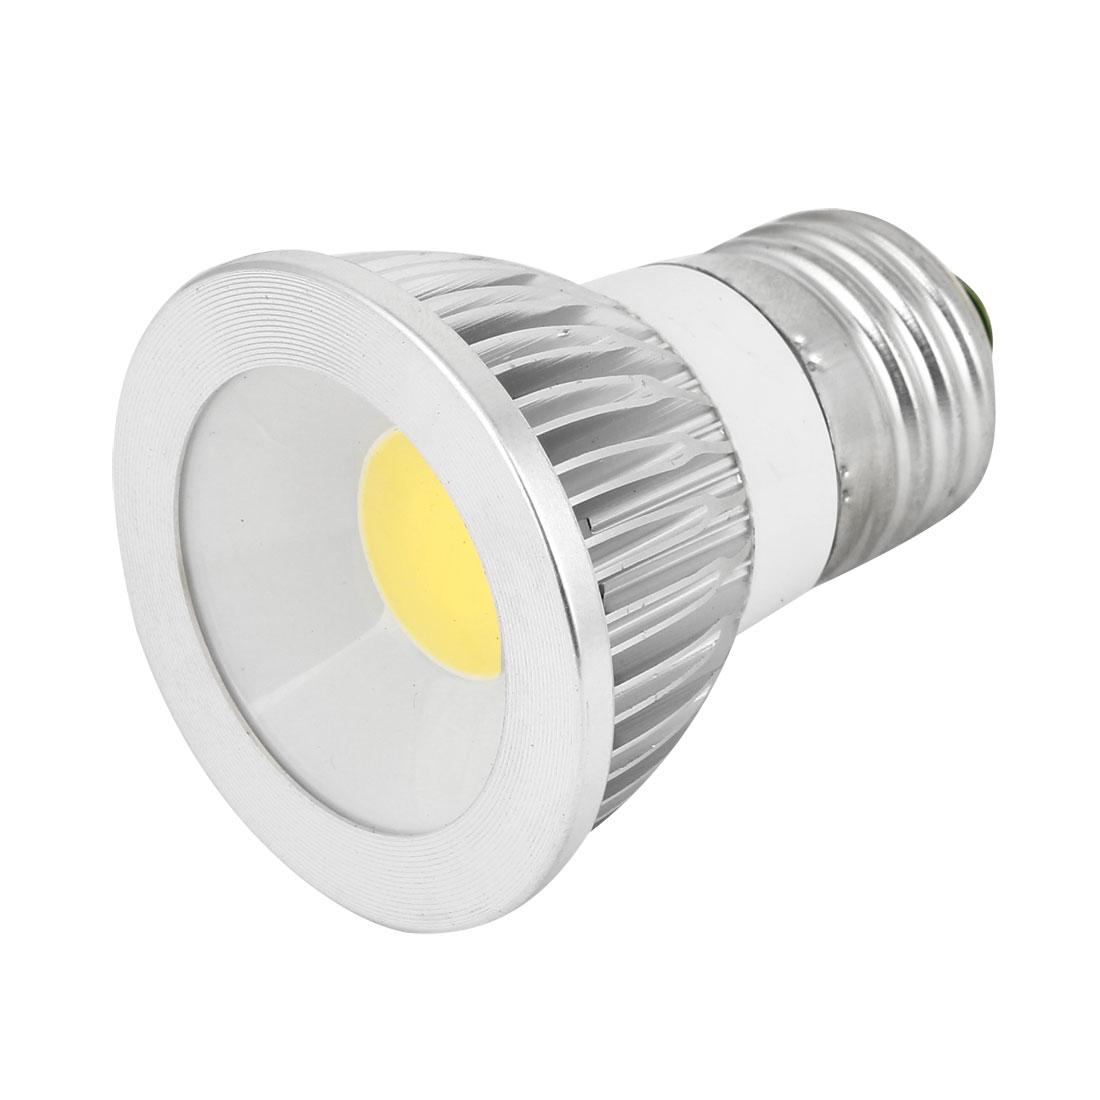 AC 85-265V 6W E27 Non-dimmable White Light COB LED Downlight Spotlight